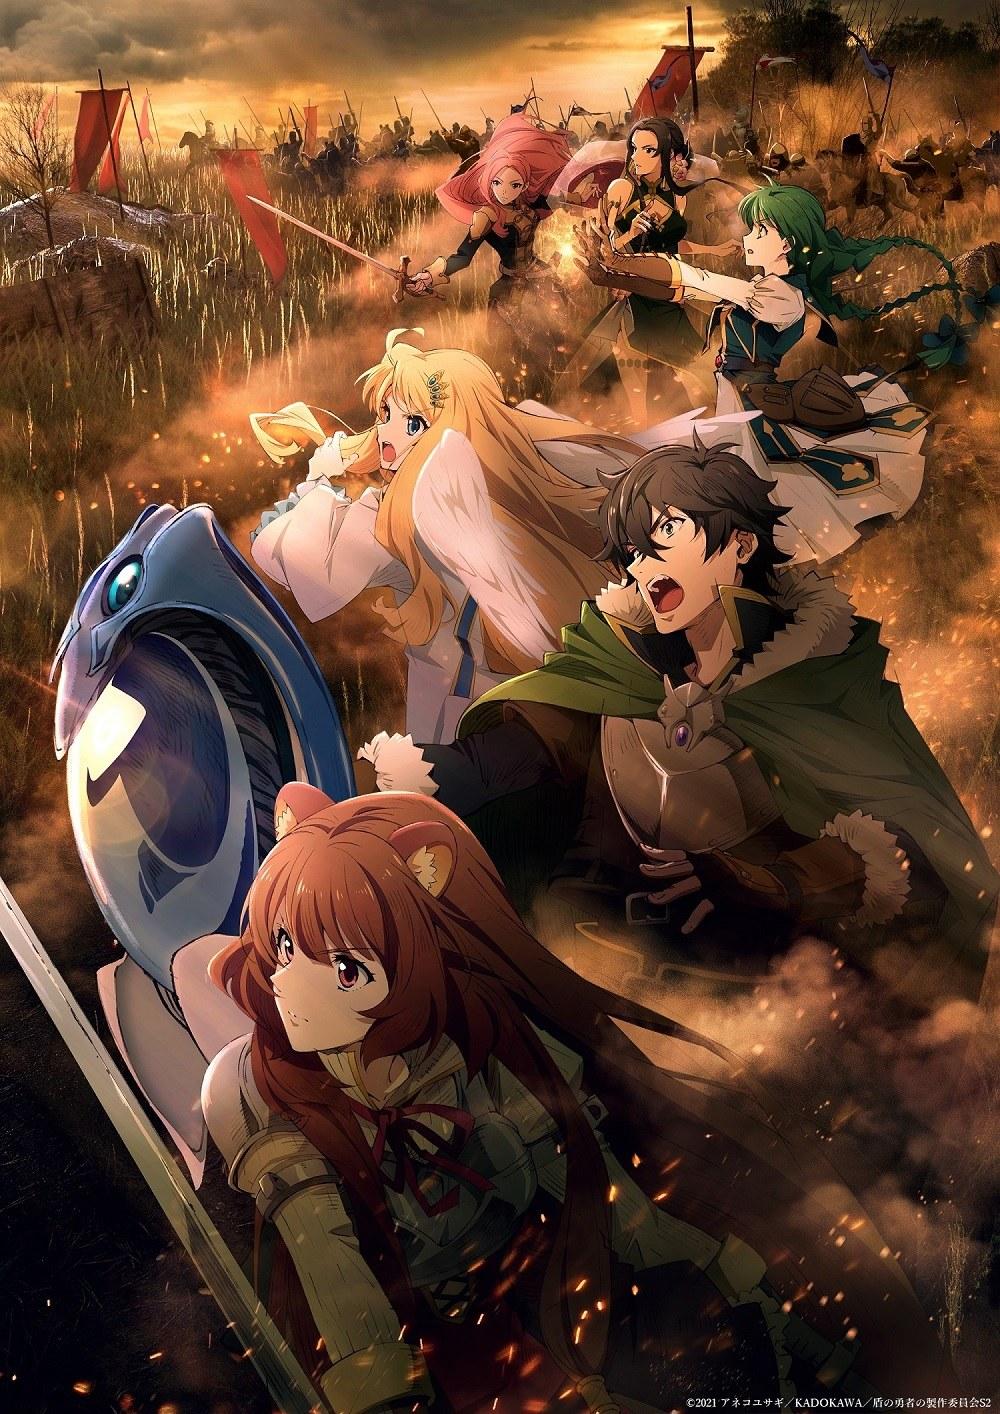 [ANIME/MANGA] The Rising of the Shield Hero (Tate No Yuusha no Nariagari) 15992910